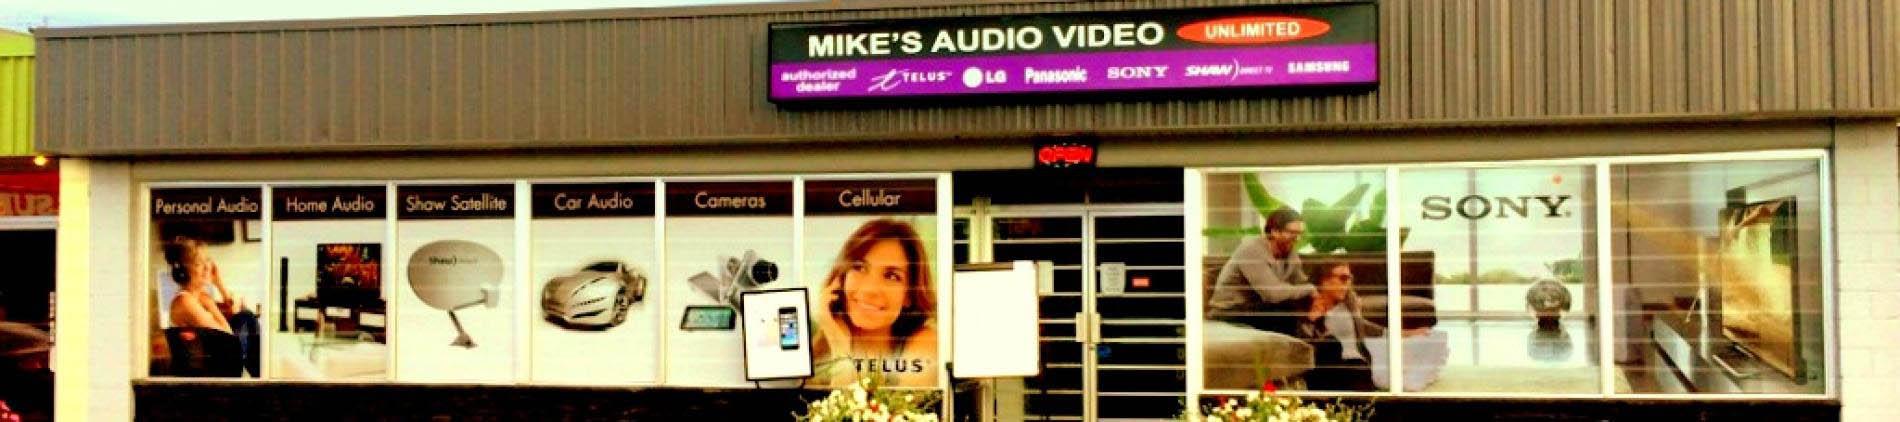 Mikes Audio Video